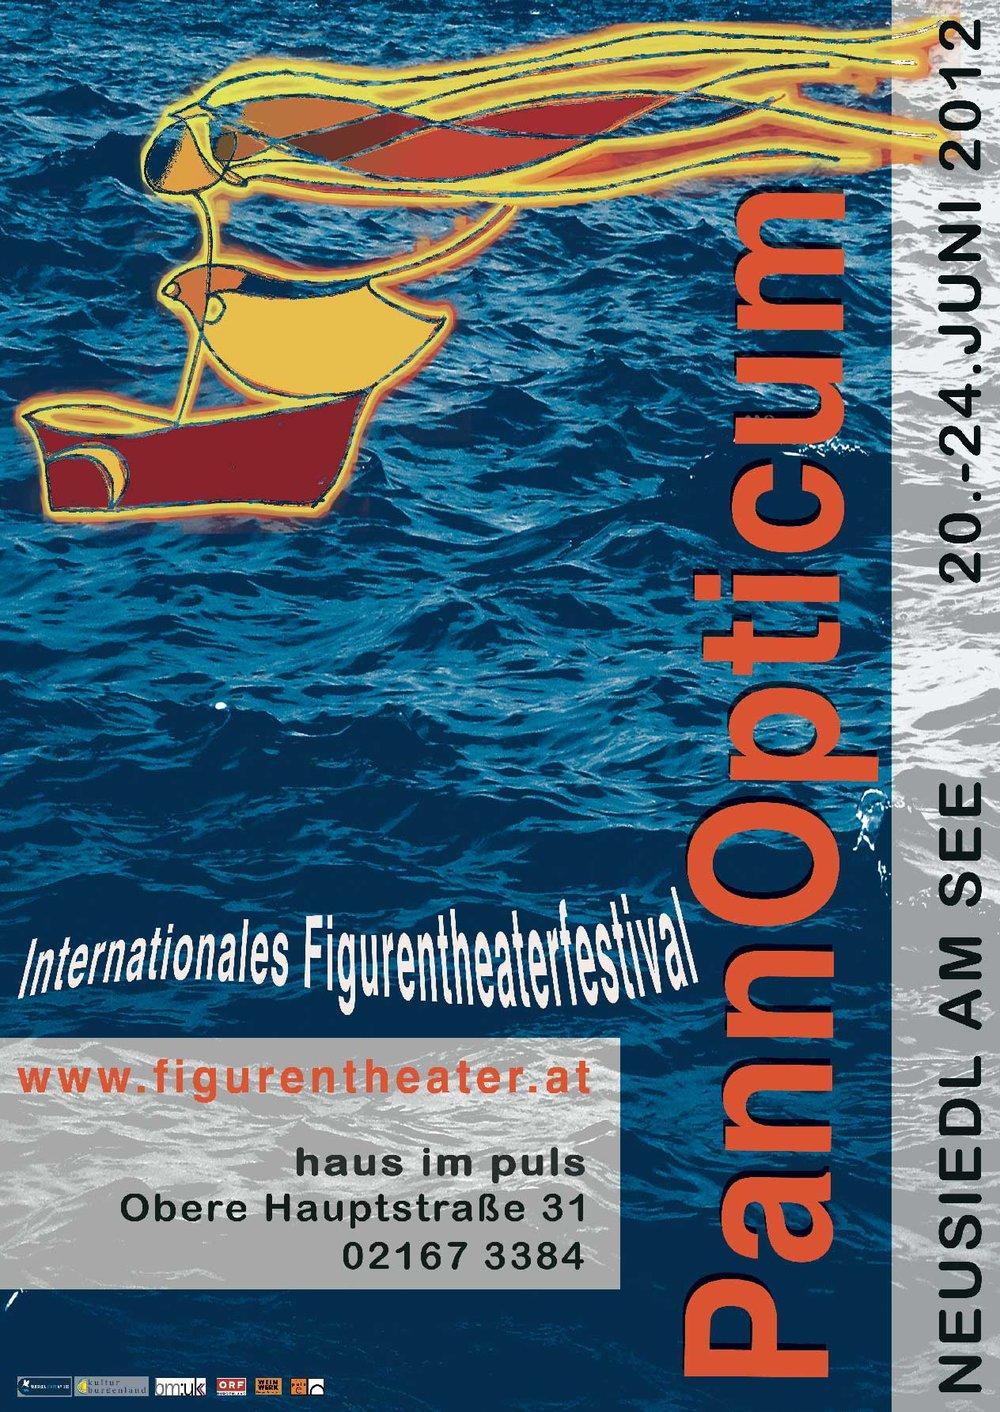 PannOpticum-2012-International-Festival-Neusiedl-am-See-Austria.jpg